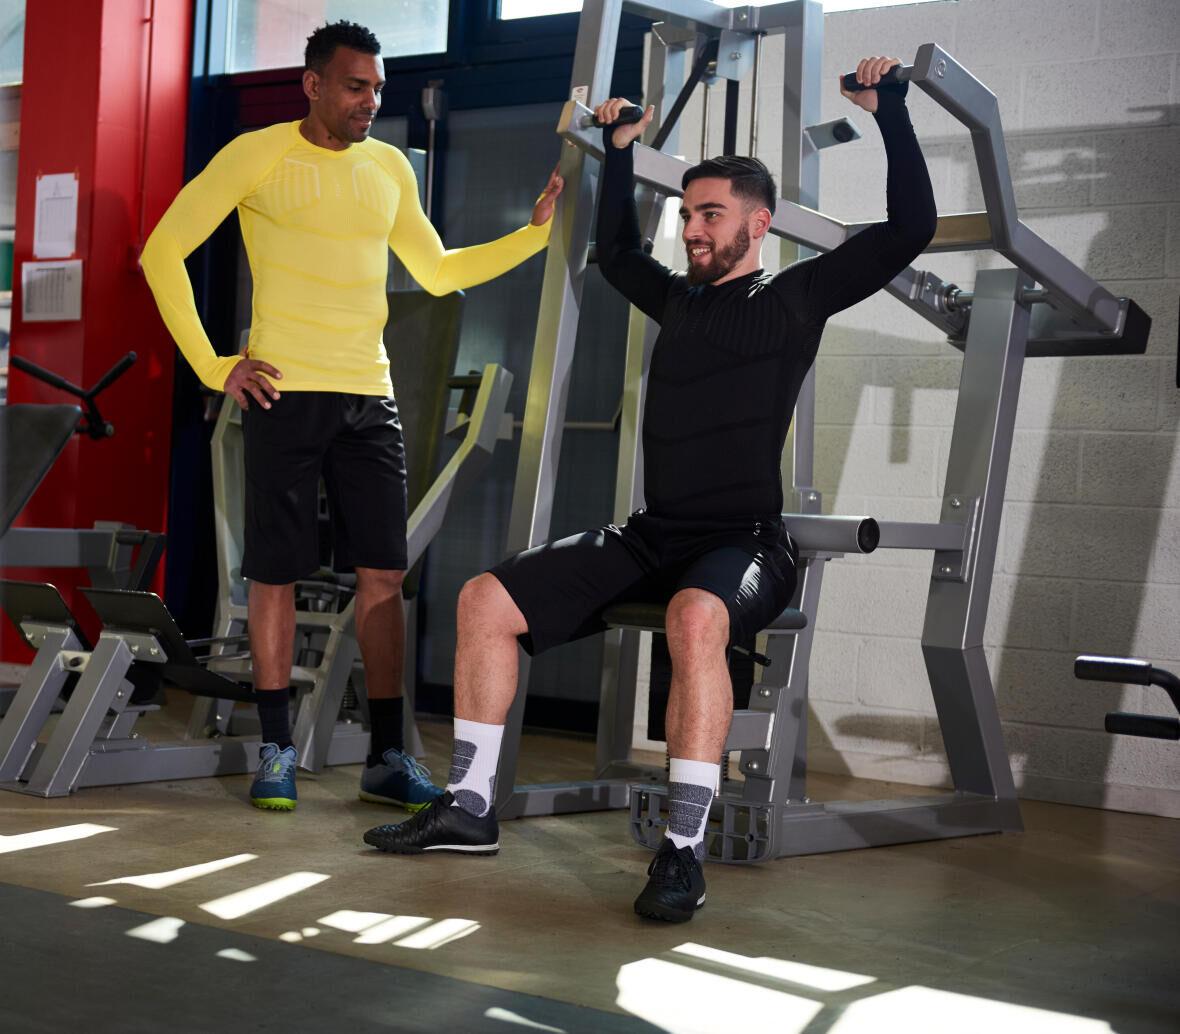 Running-muscle-strengthening